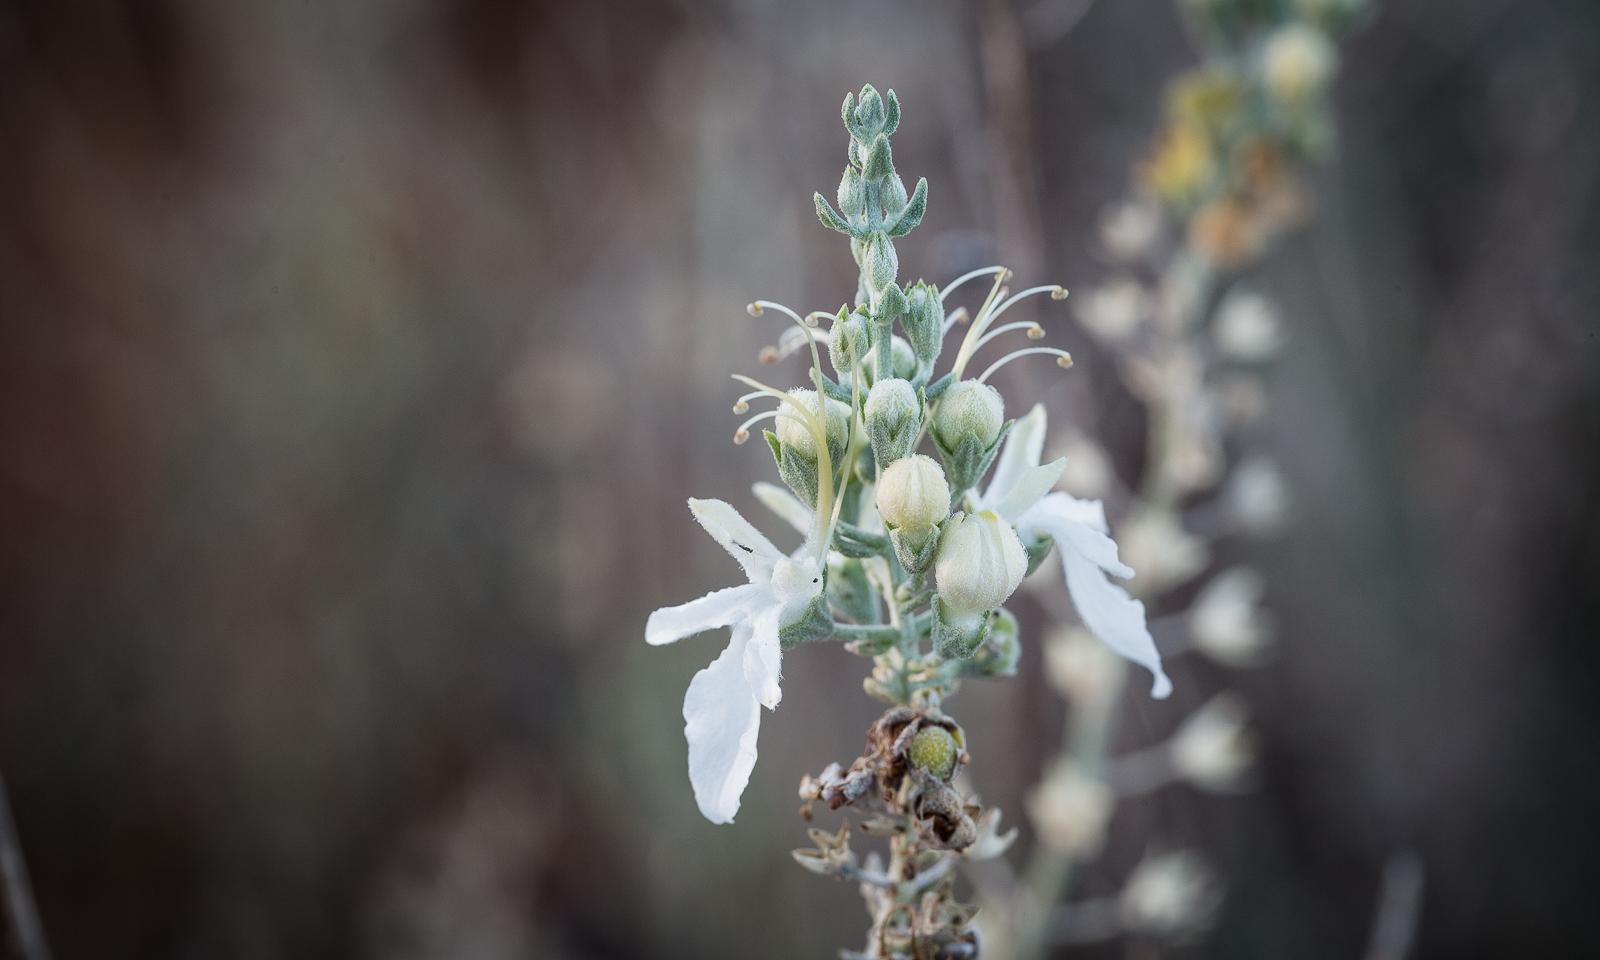 Teucrium albicaule cccurs in arid chenopod grasslands